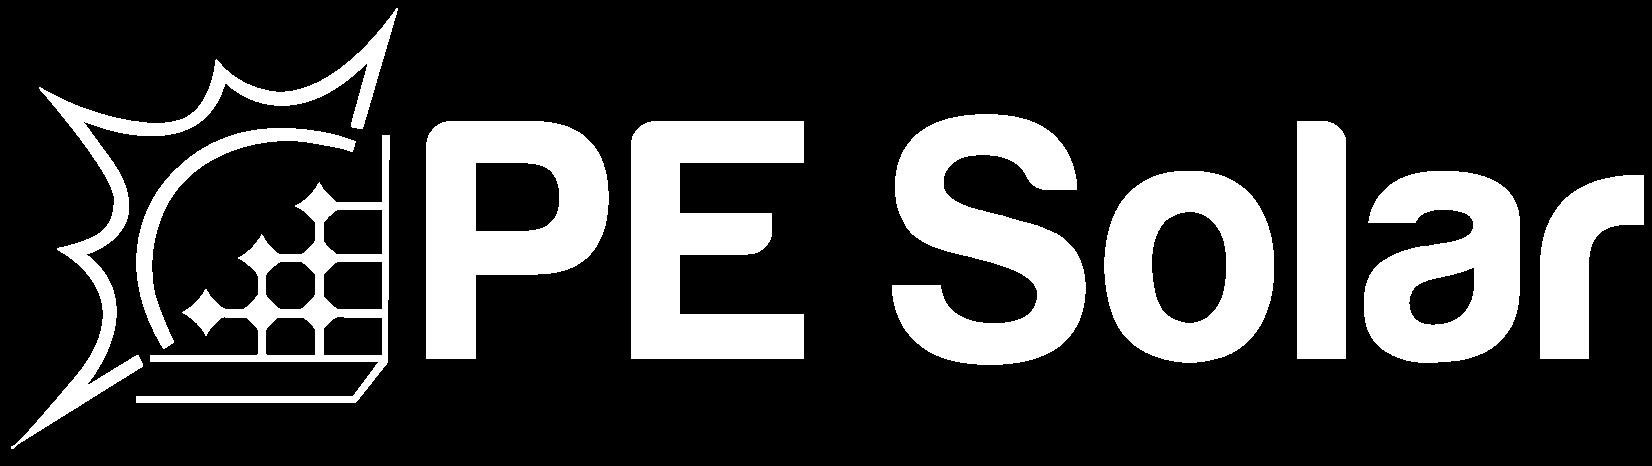 PESolar-Logo_White_TransBG